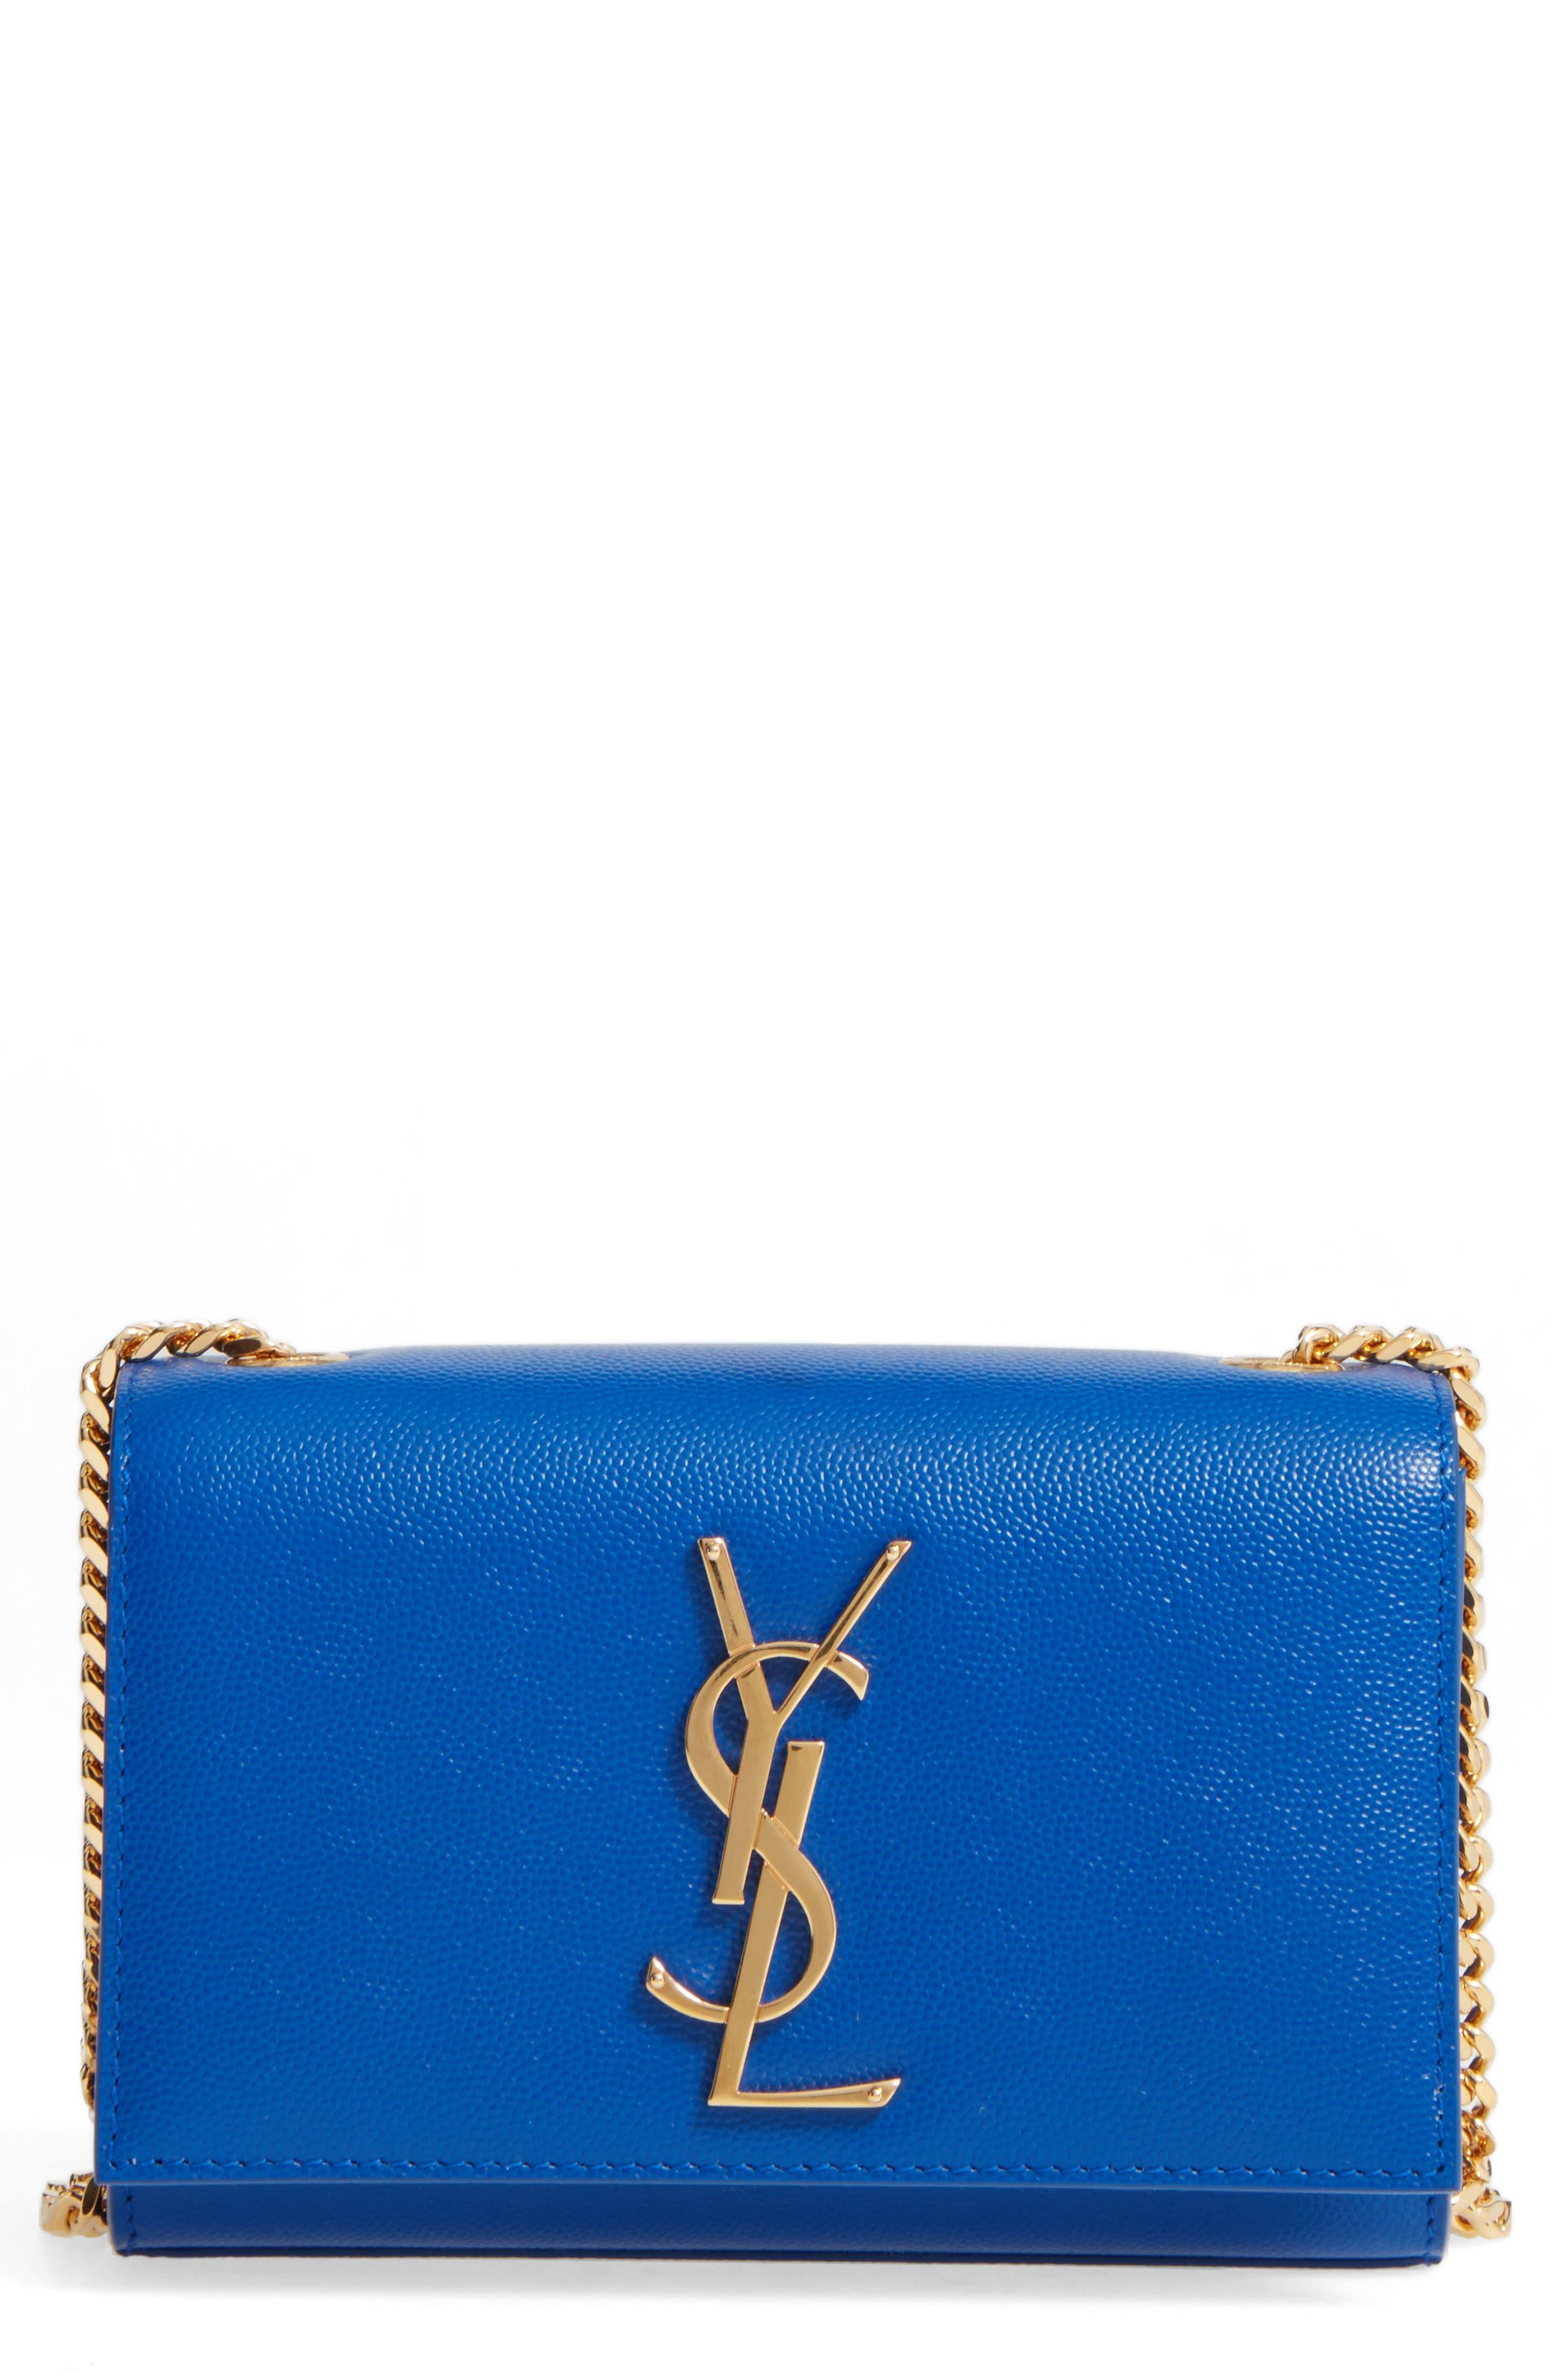 SAINT LAURENT Small Kate Chain Crossbody Bag, Main, color, ELECTRIC BLUE